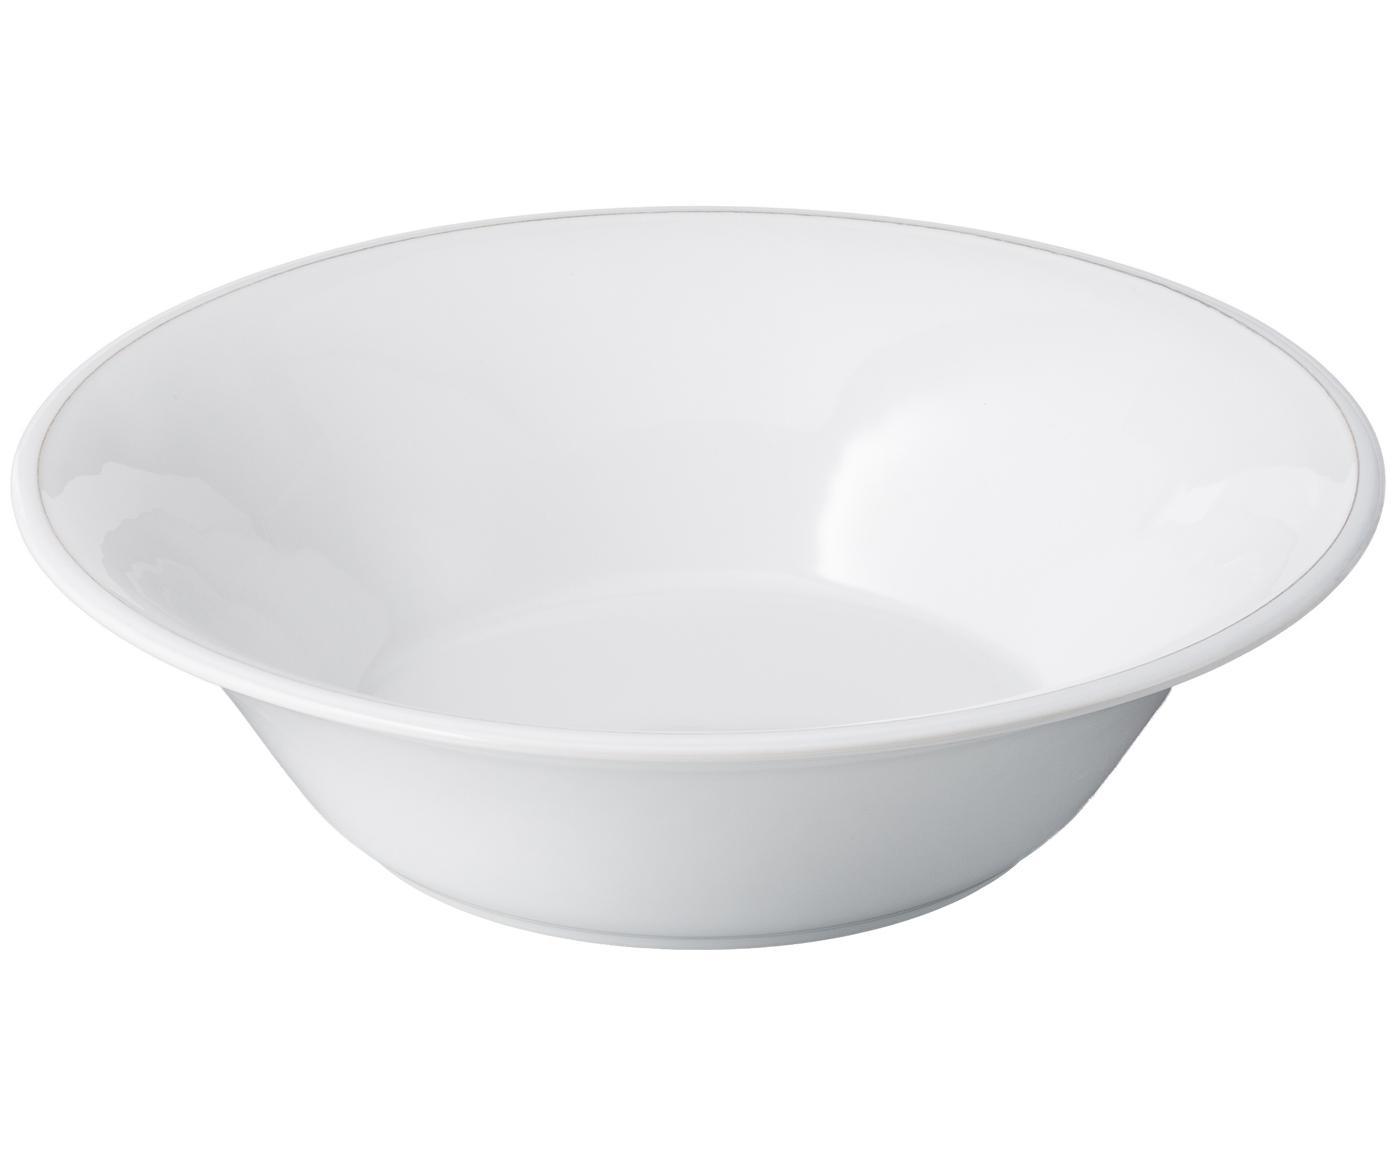 Insalatiera color bianco Constance, Ceramica, Bianco, Ø 30 x Alt. 9 cm